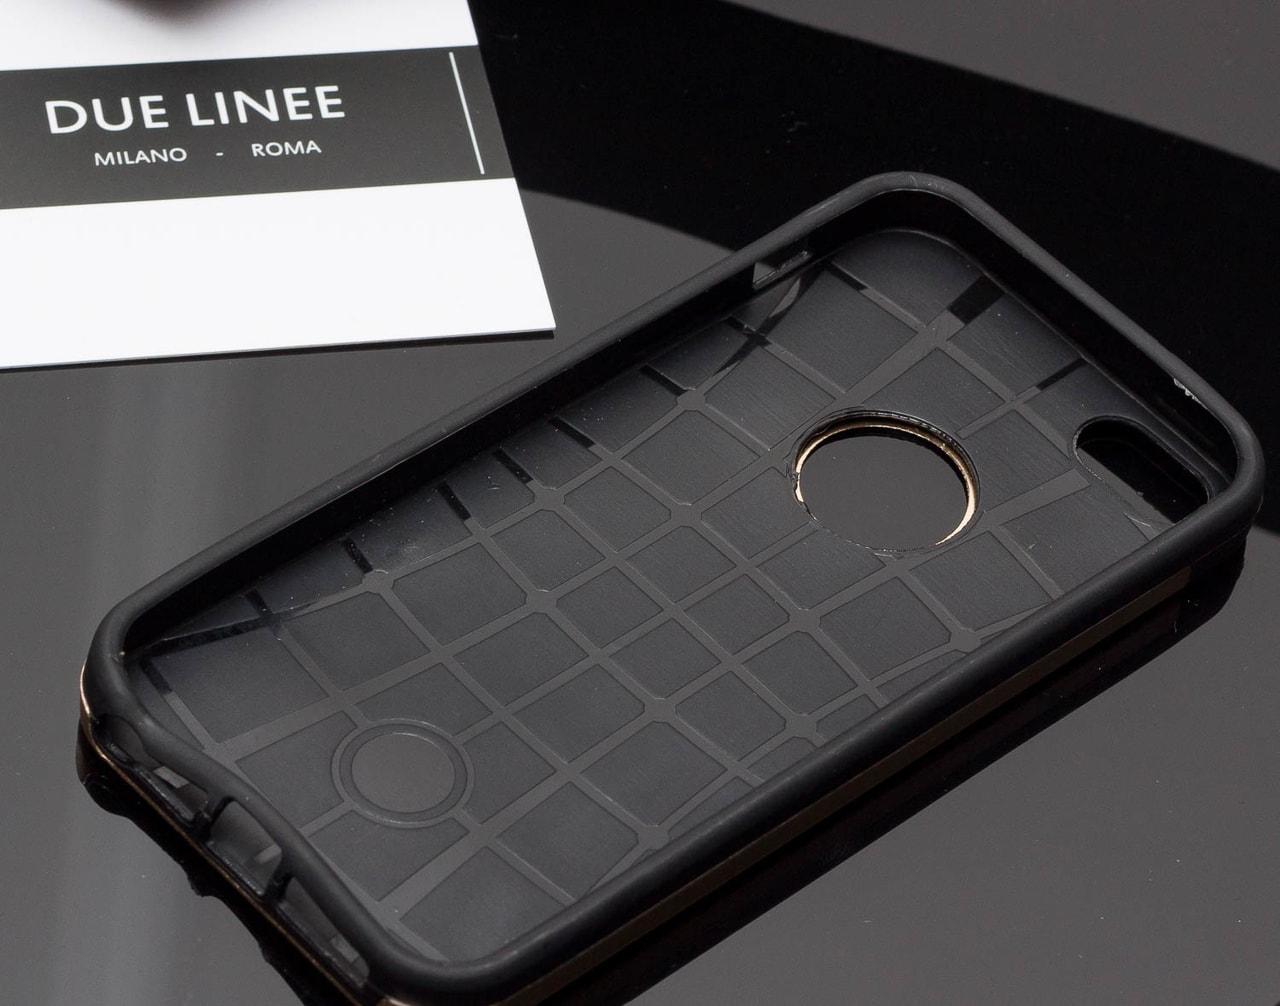 Glamadise.sk - Kryt na Iphone 6   6S - matná zlatá - Due Linee ... b00792cd98b